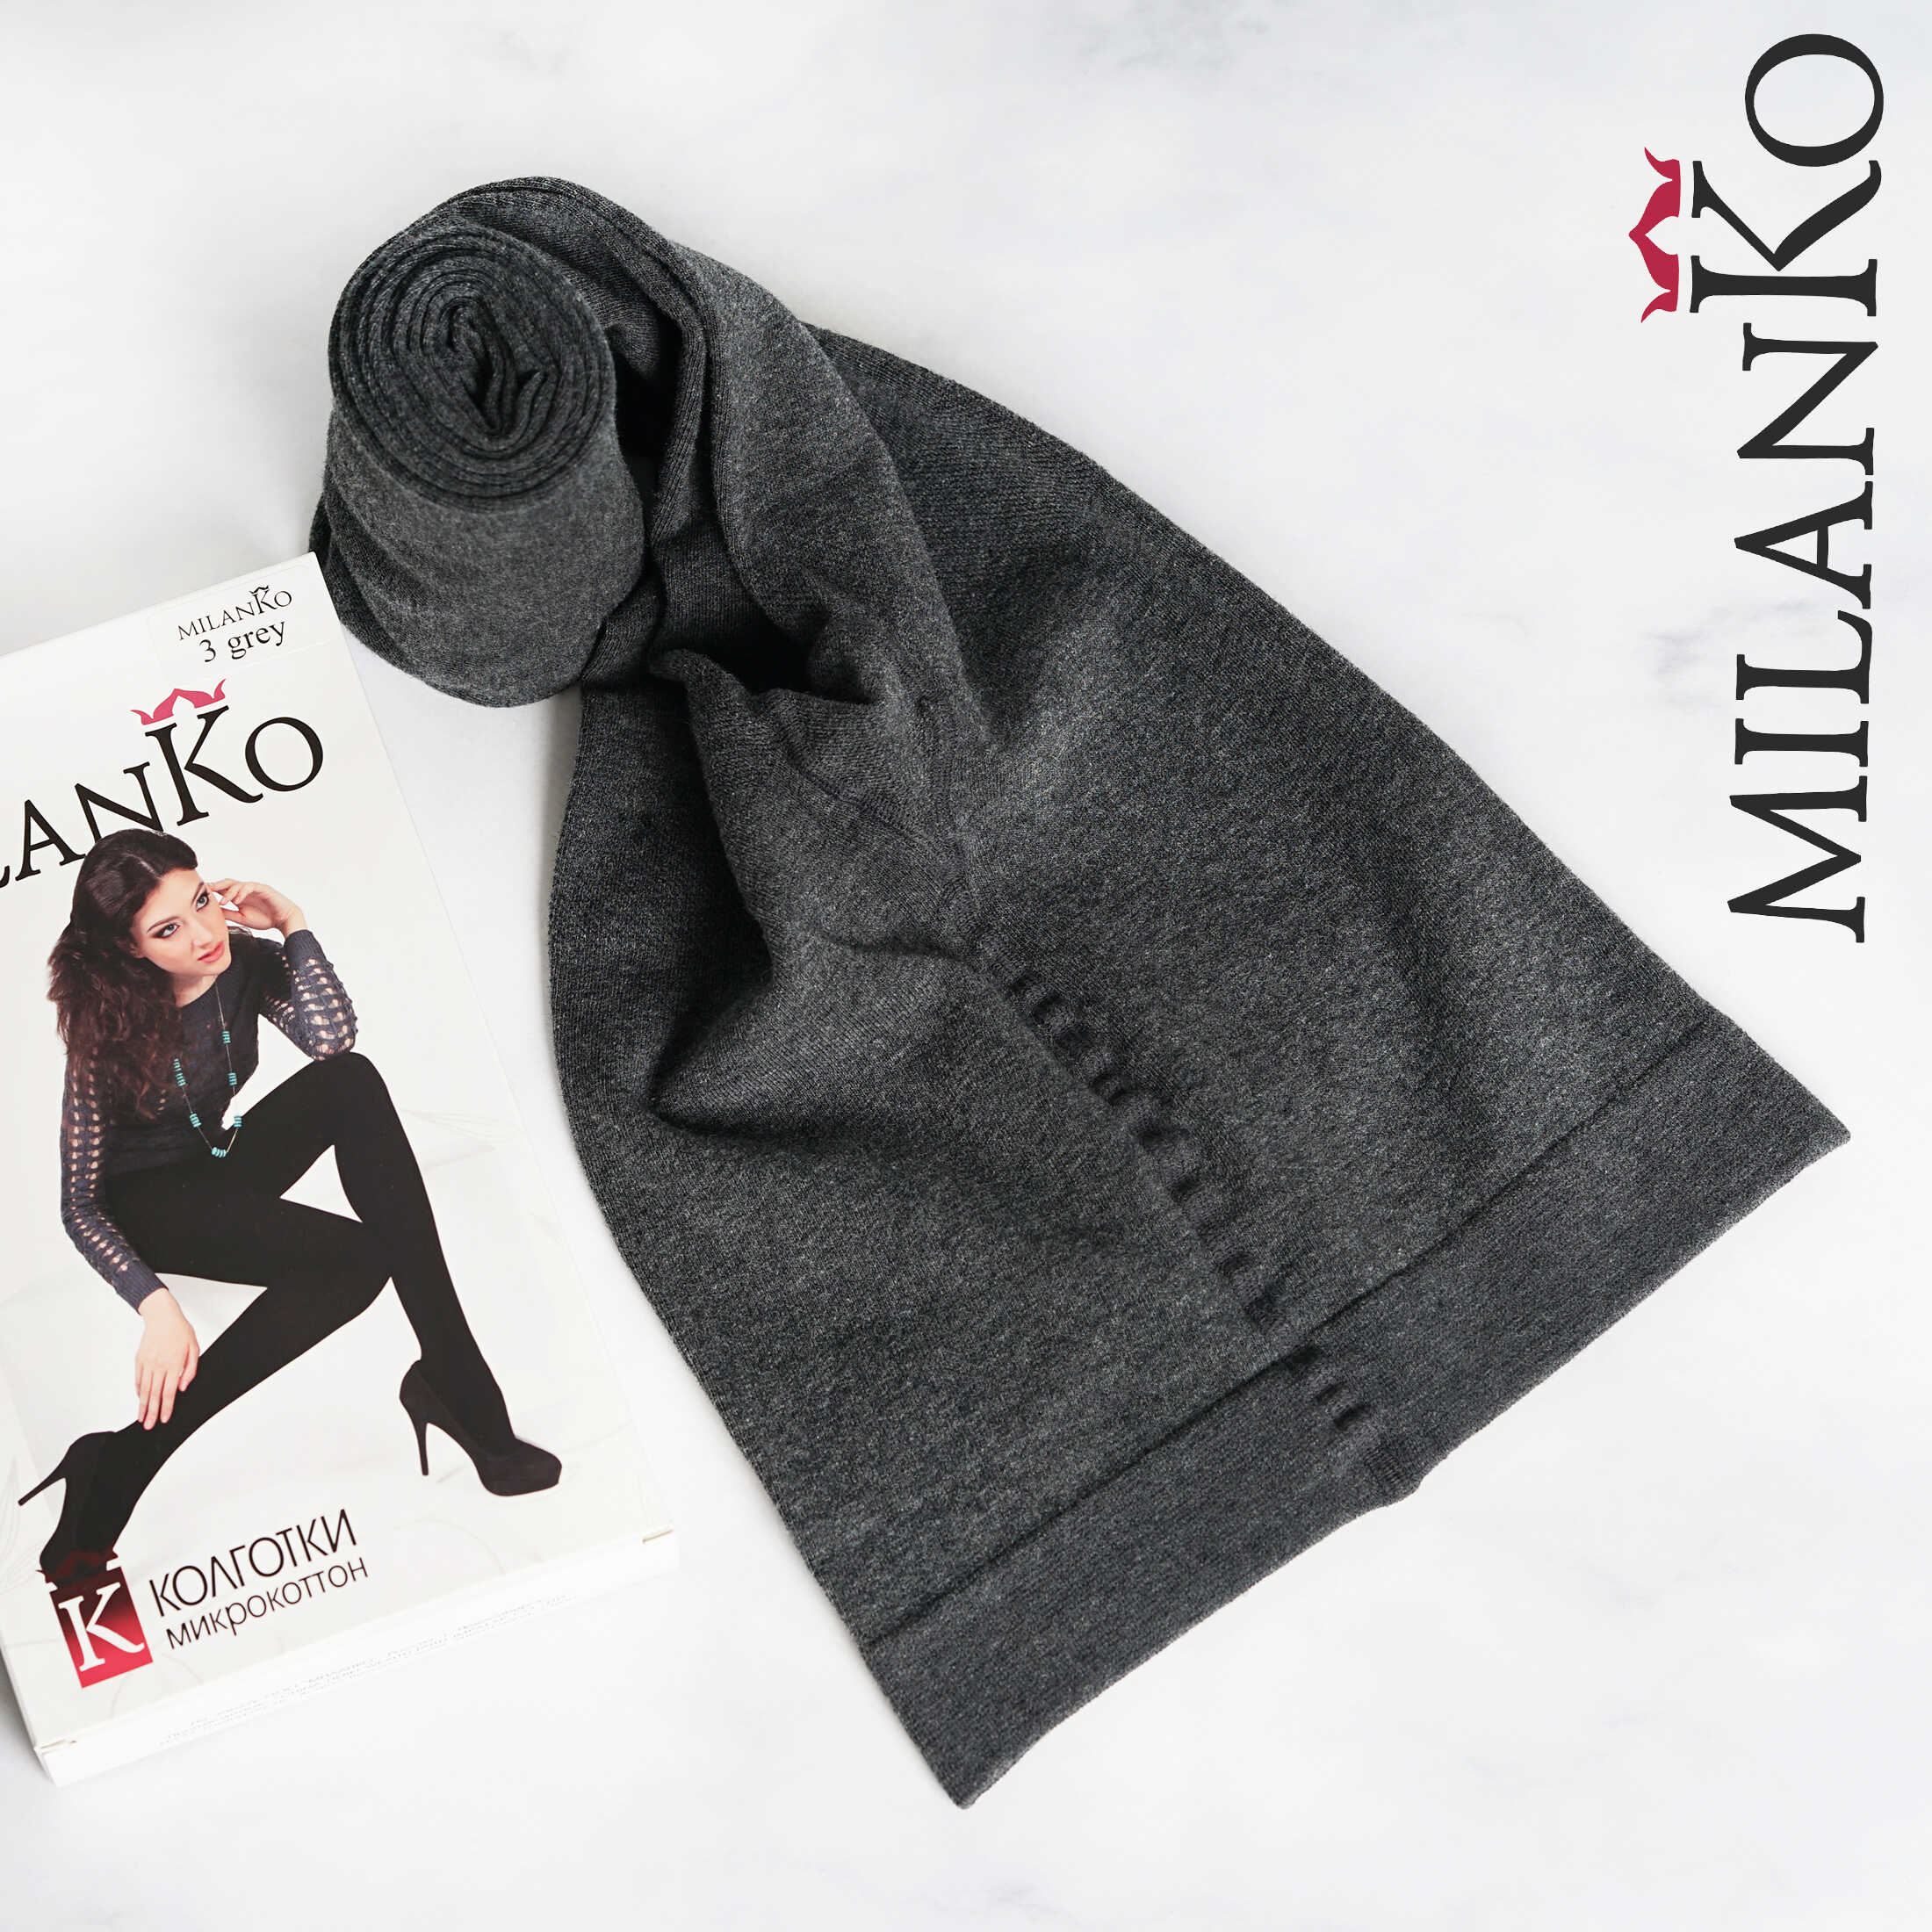 Женские колготки микрокоттон MilanKo K-037